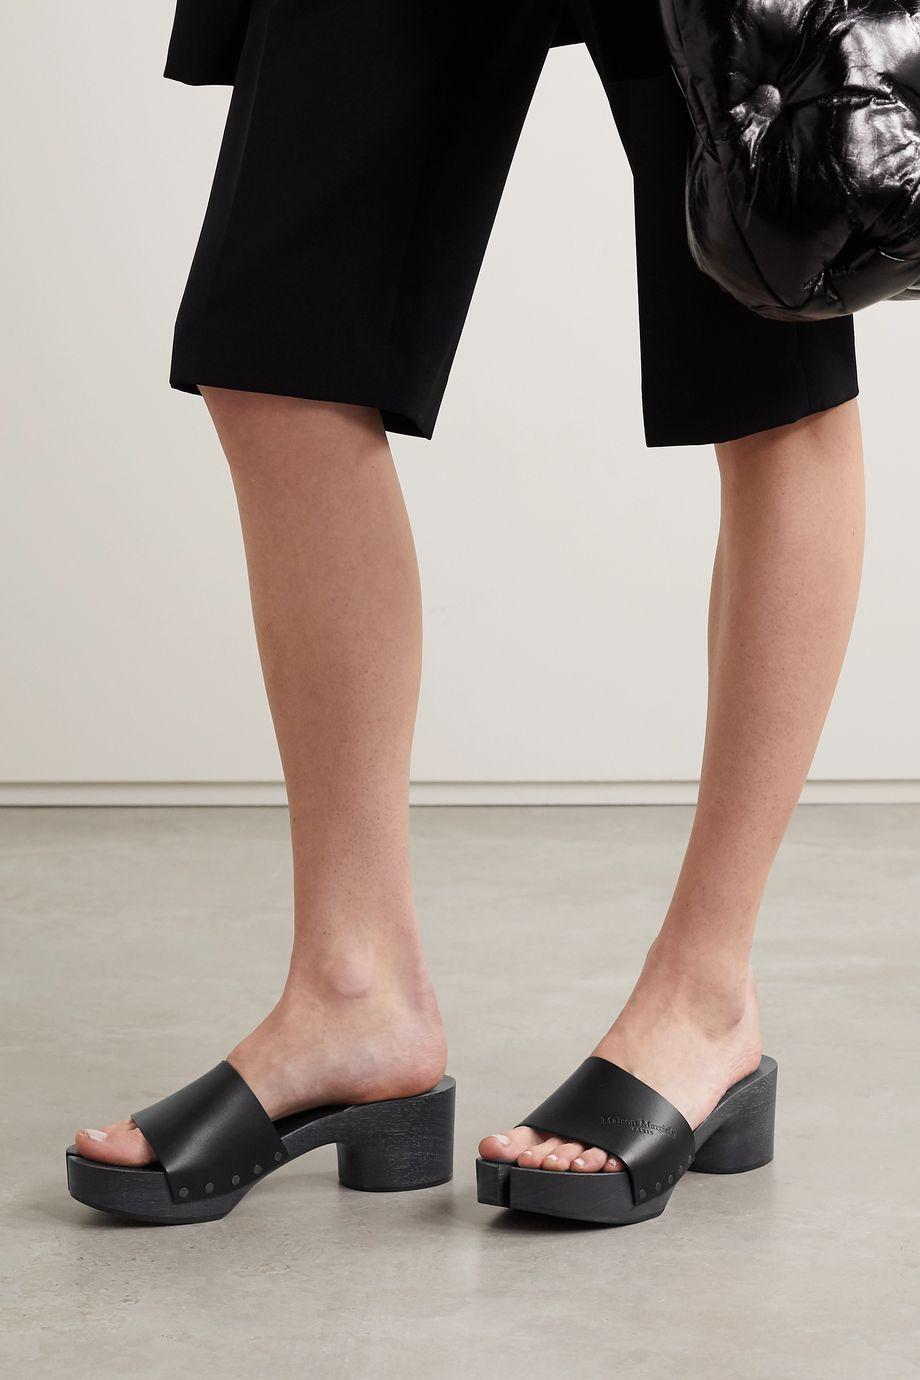 Maison Margiela Split-toe logo-debossed leather platform mules